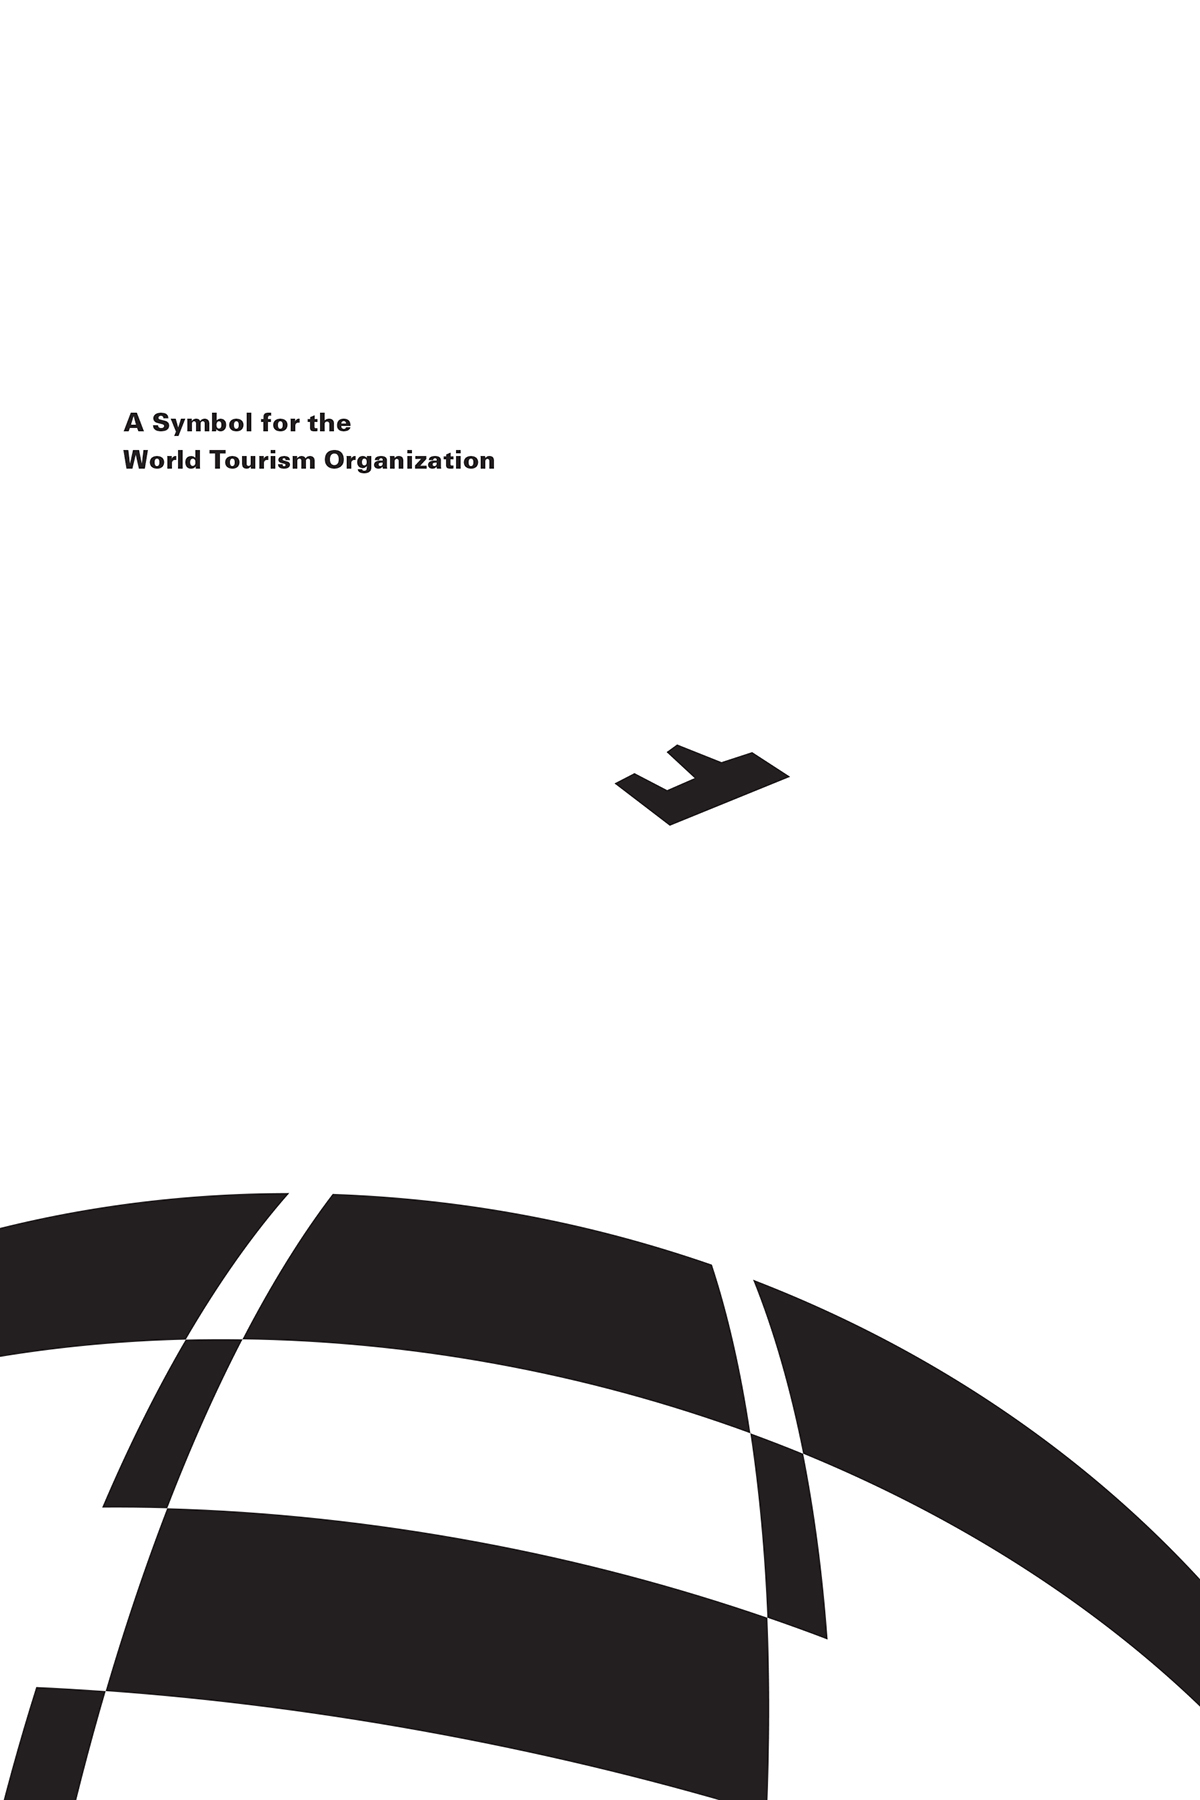 A symbol for the world tourism organization on behance buycottarizona